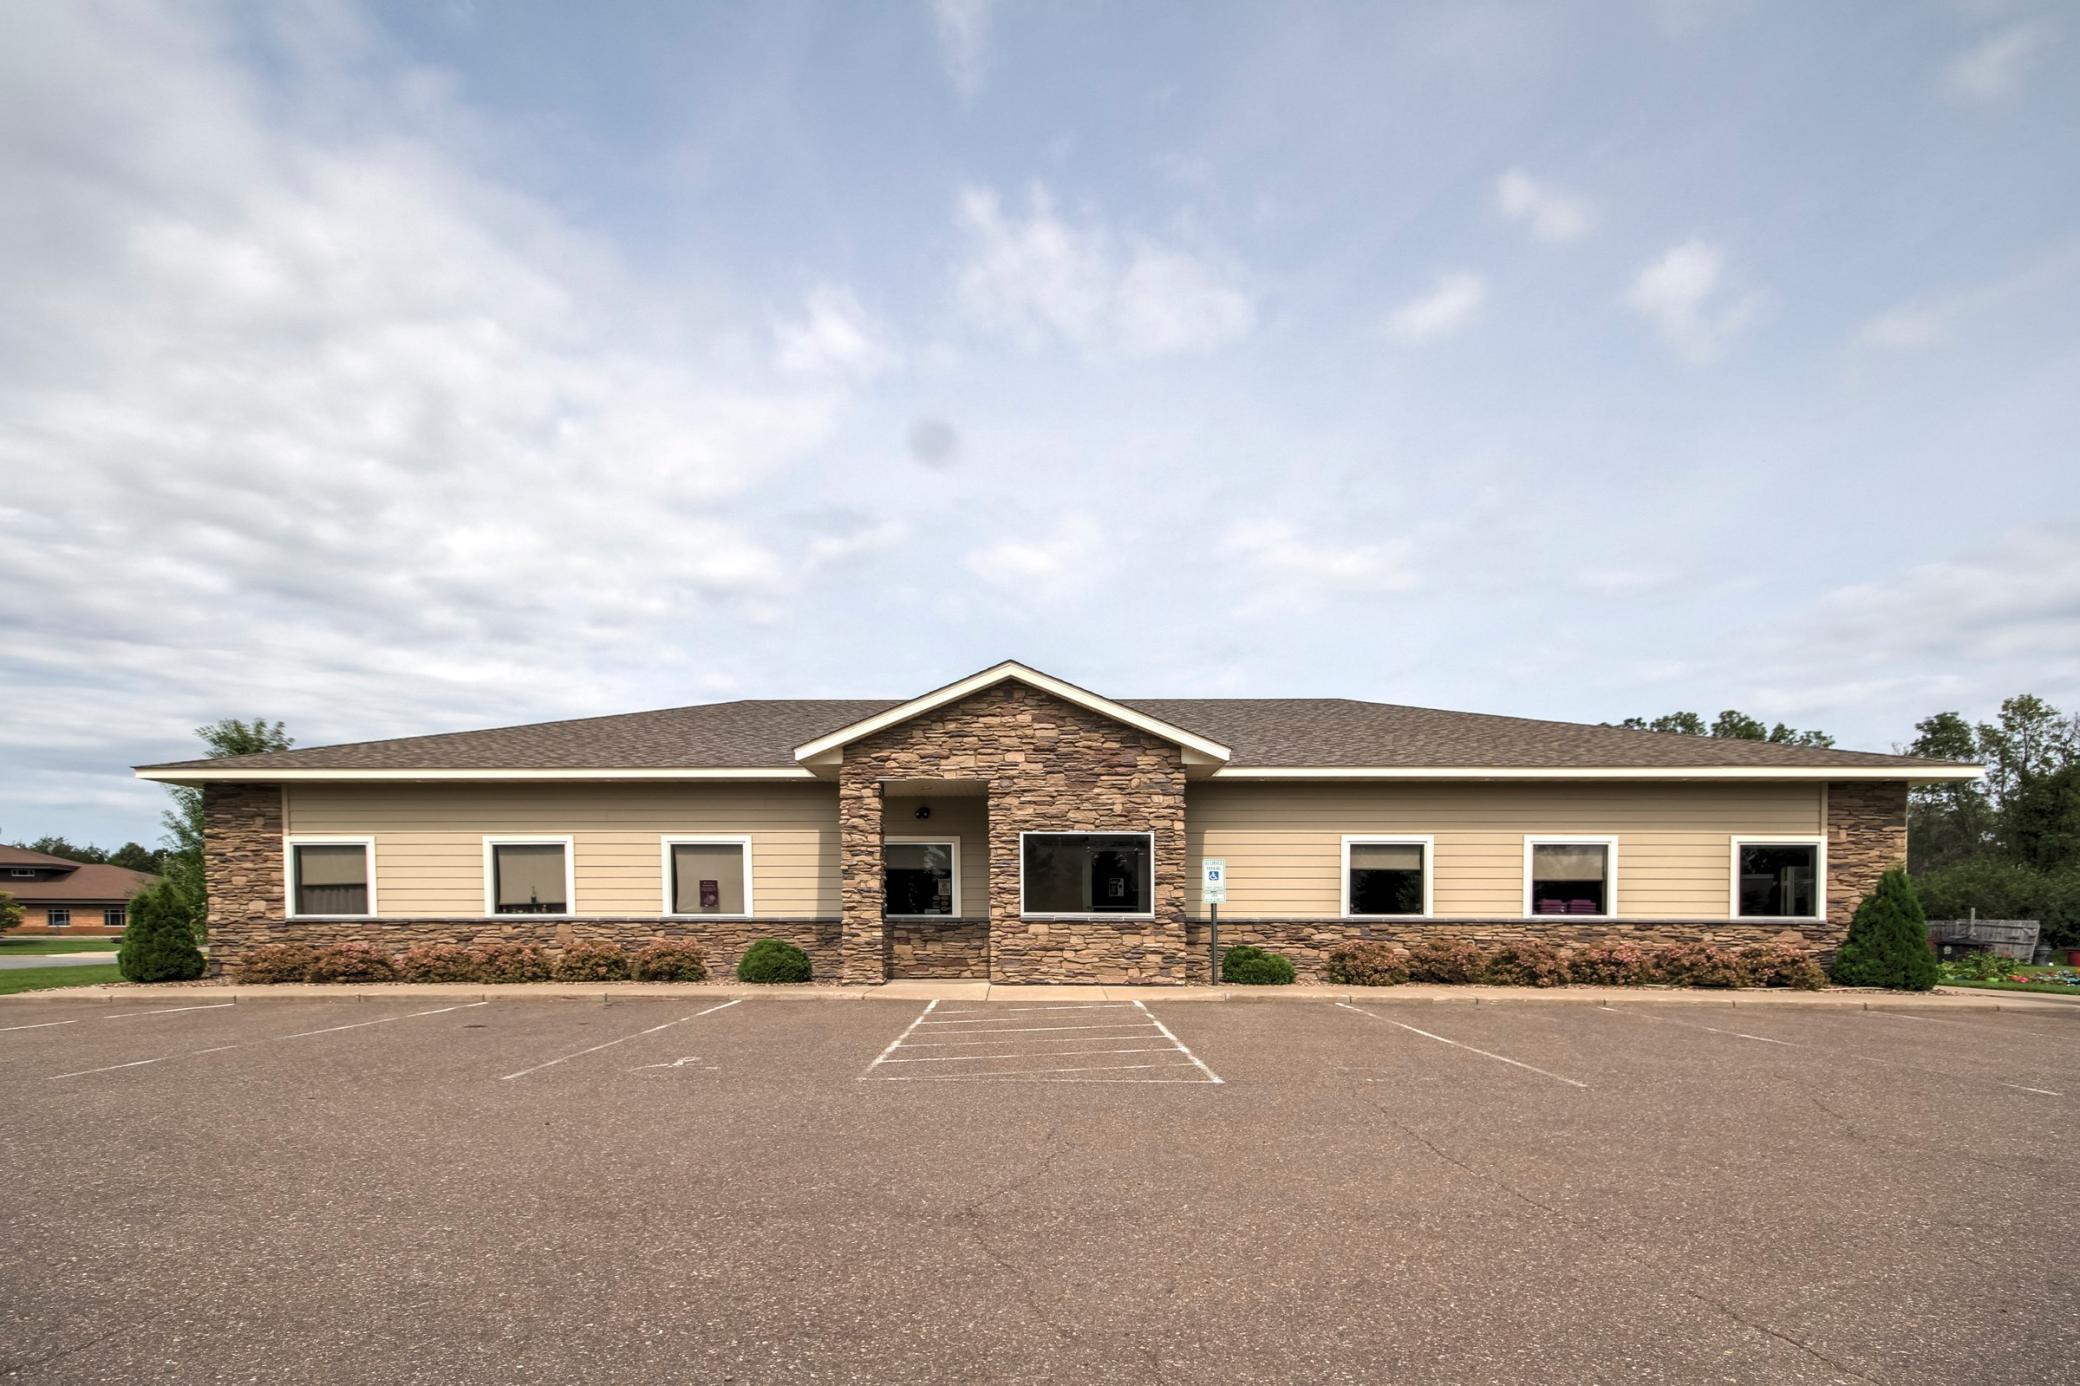 2602 Hils Court Property Photo - Menomonie, WI real estate listing